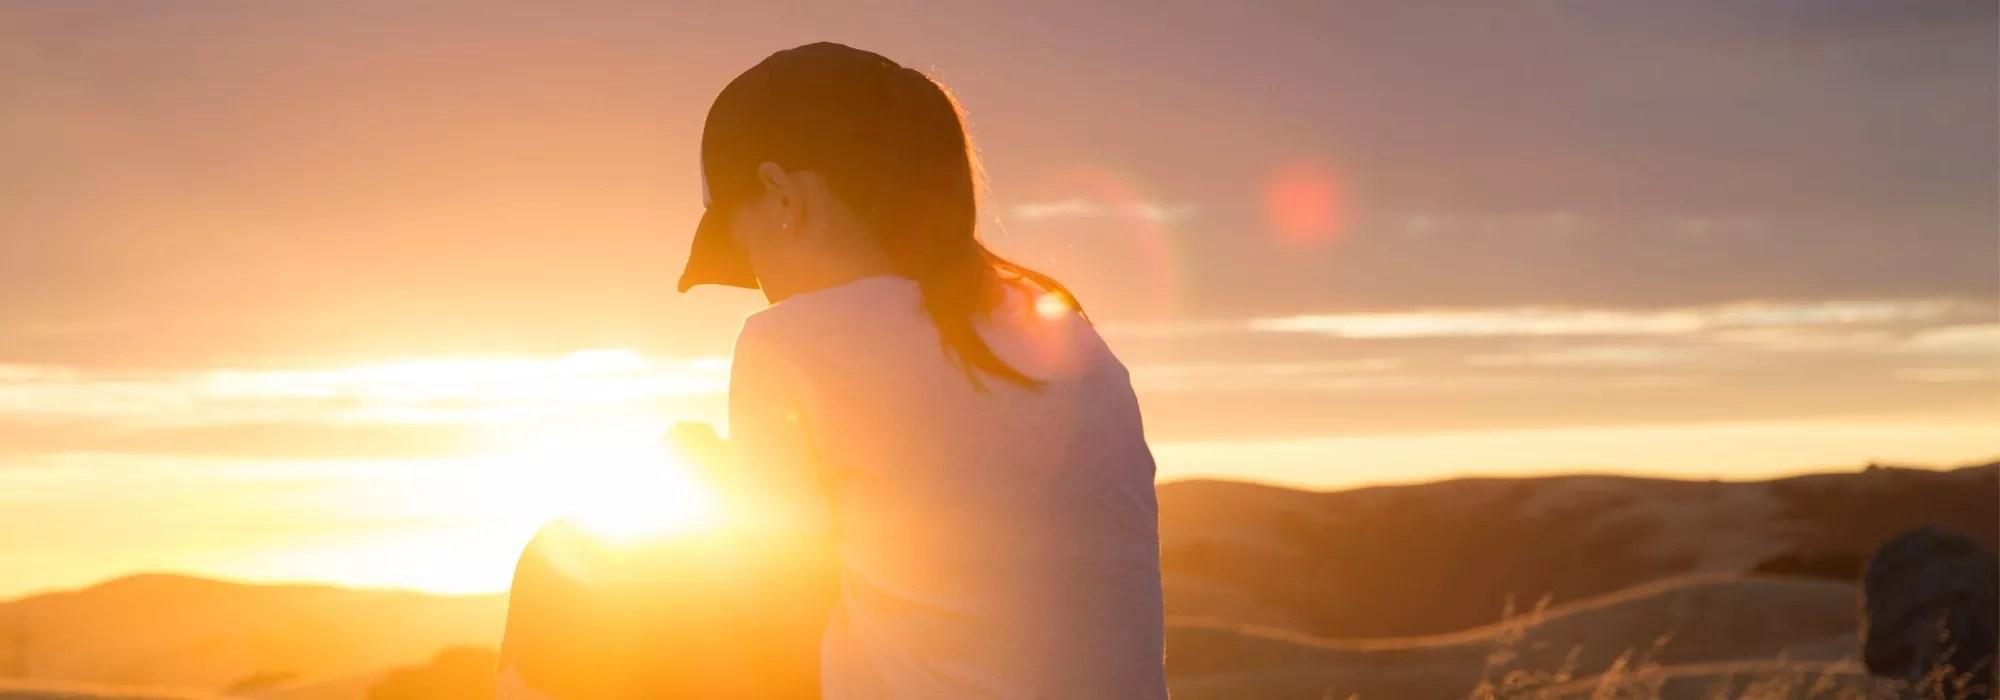 Frau betet im Sonnenuntergang oder Sonnenaufgang